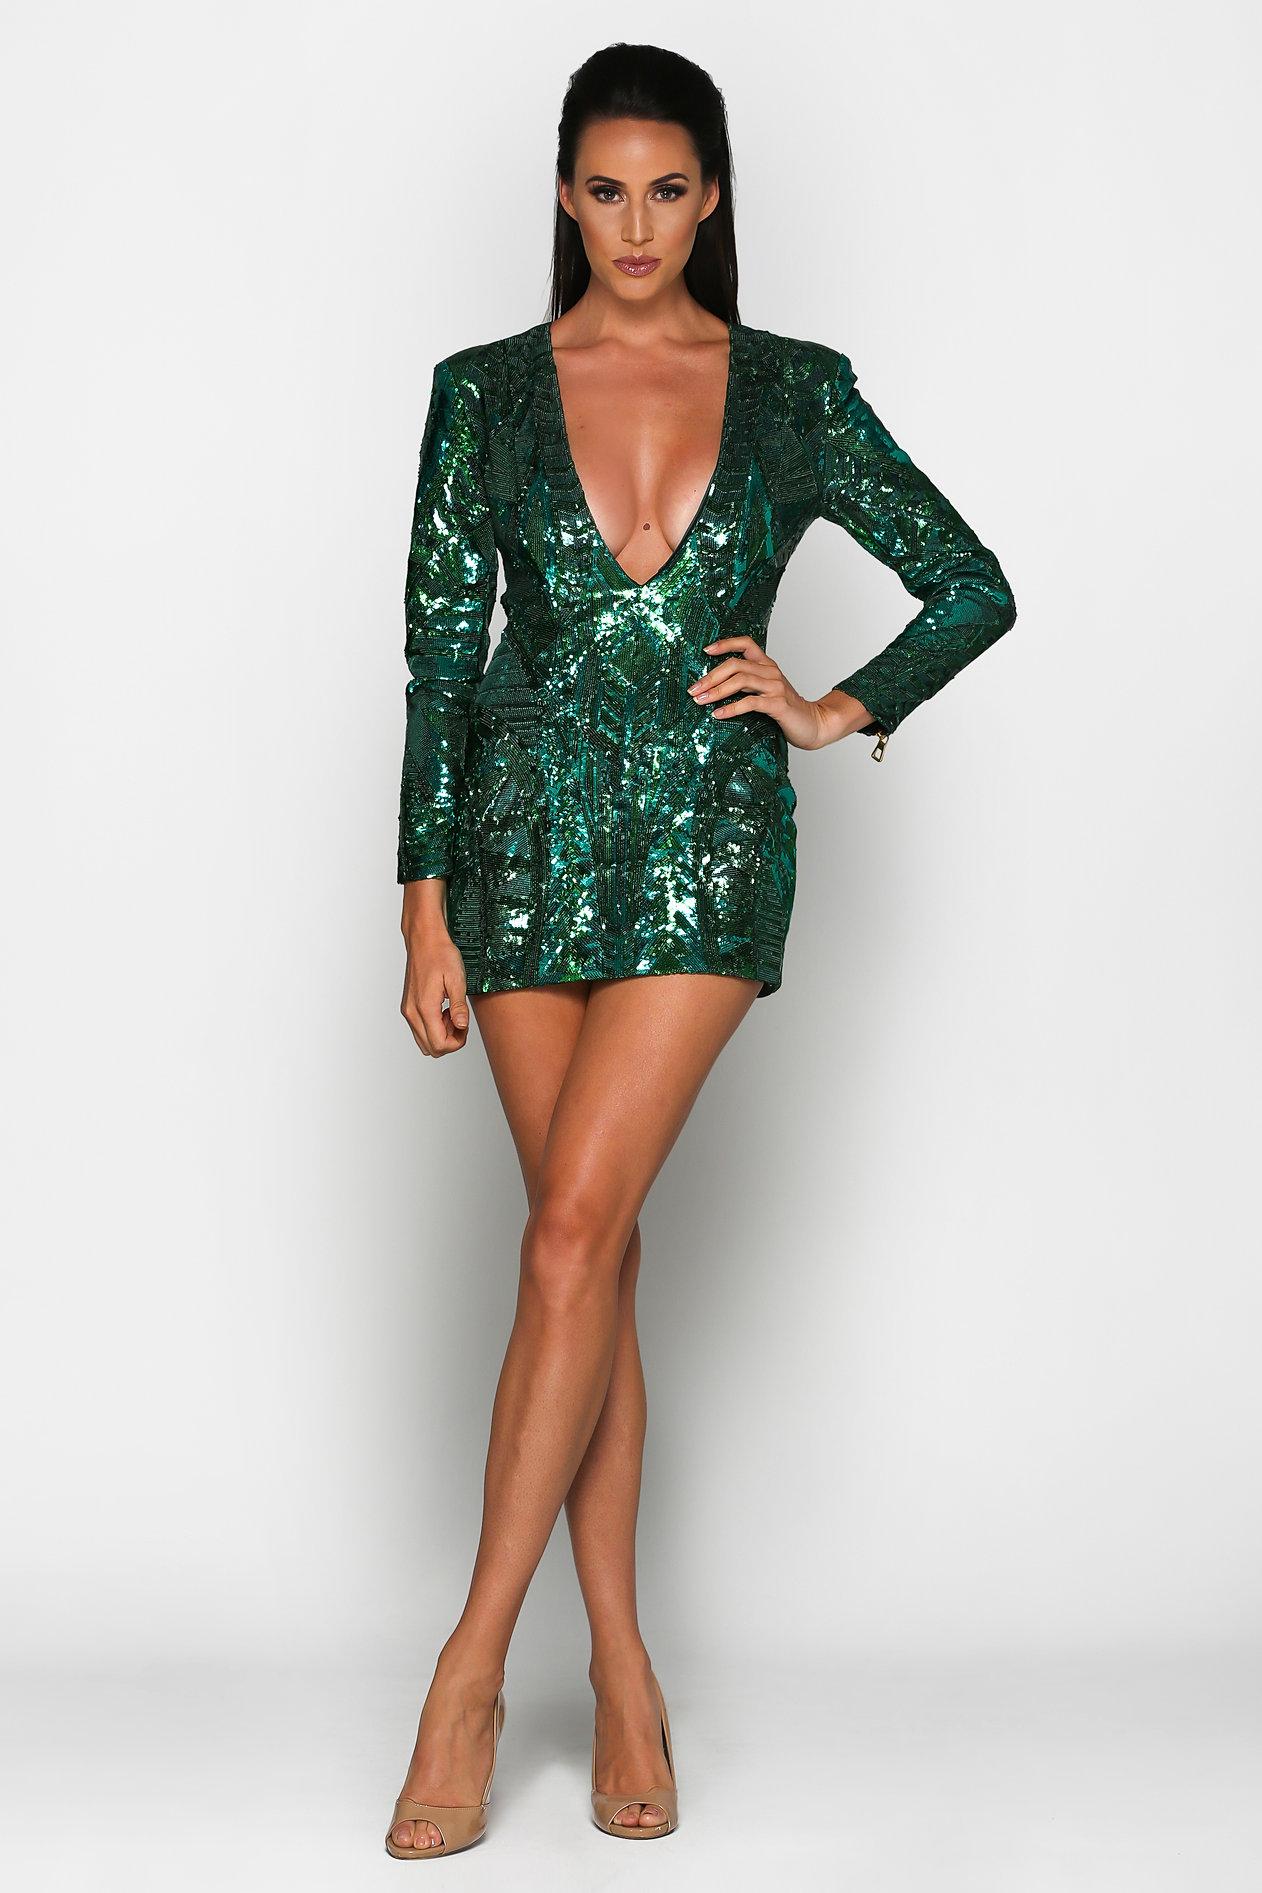 Cheap designer dresses sydney